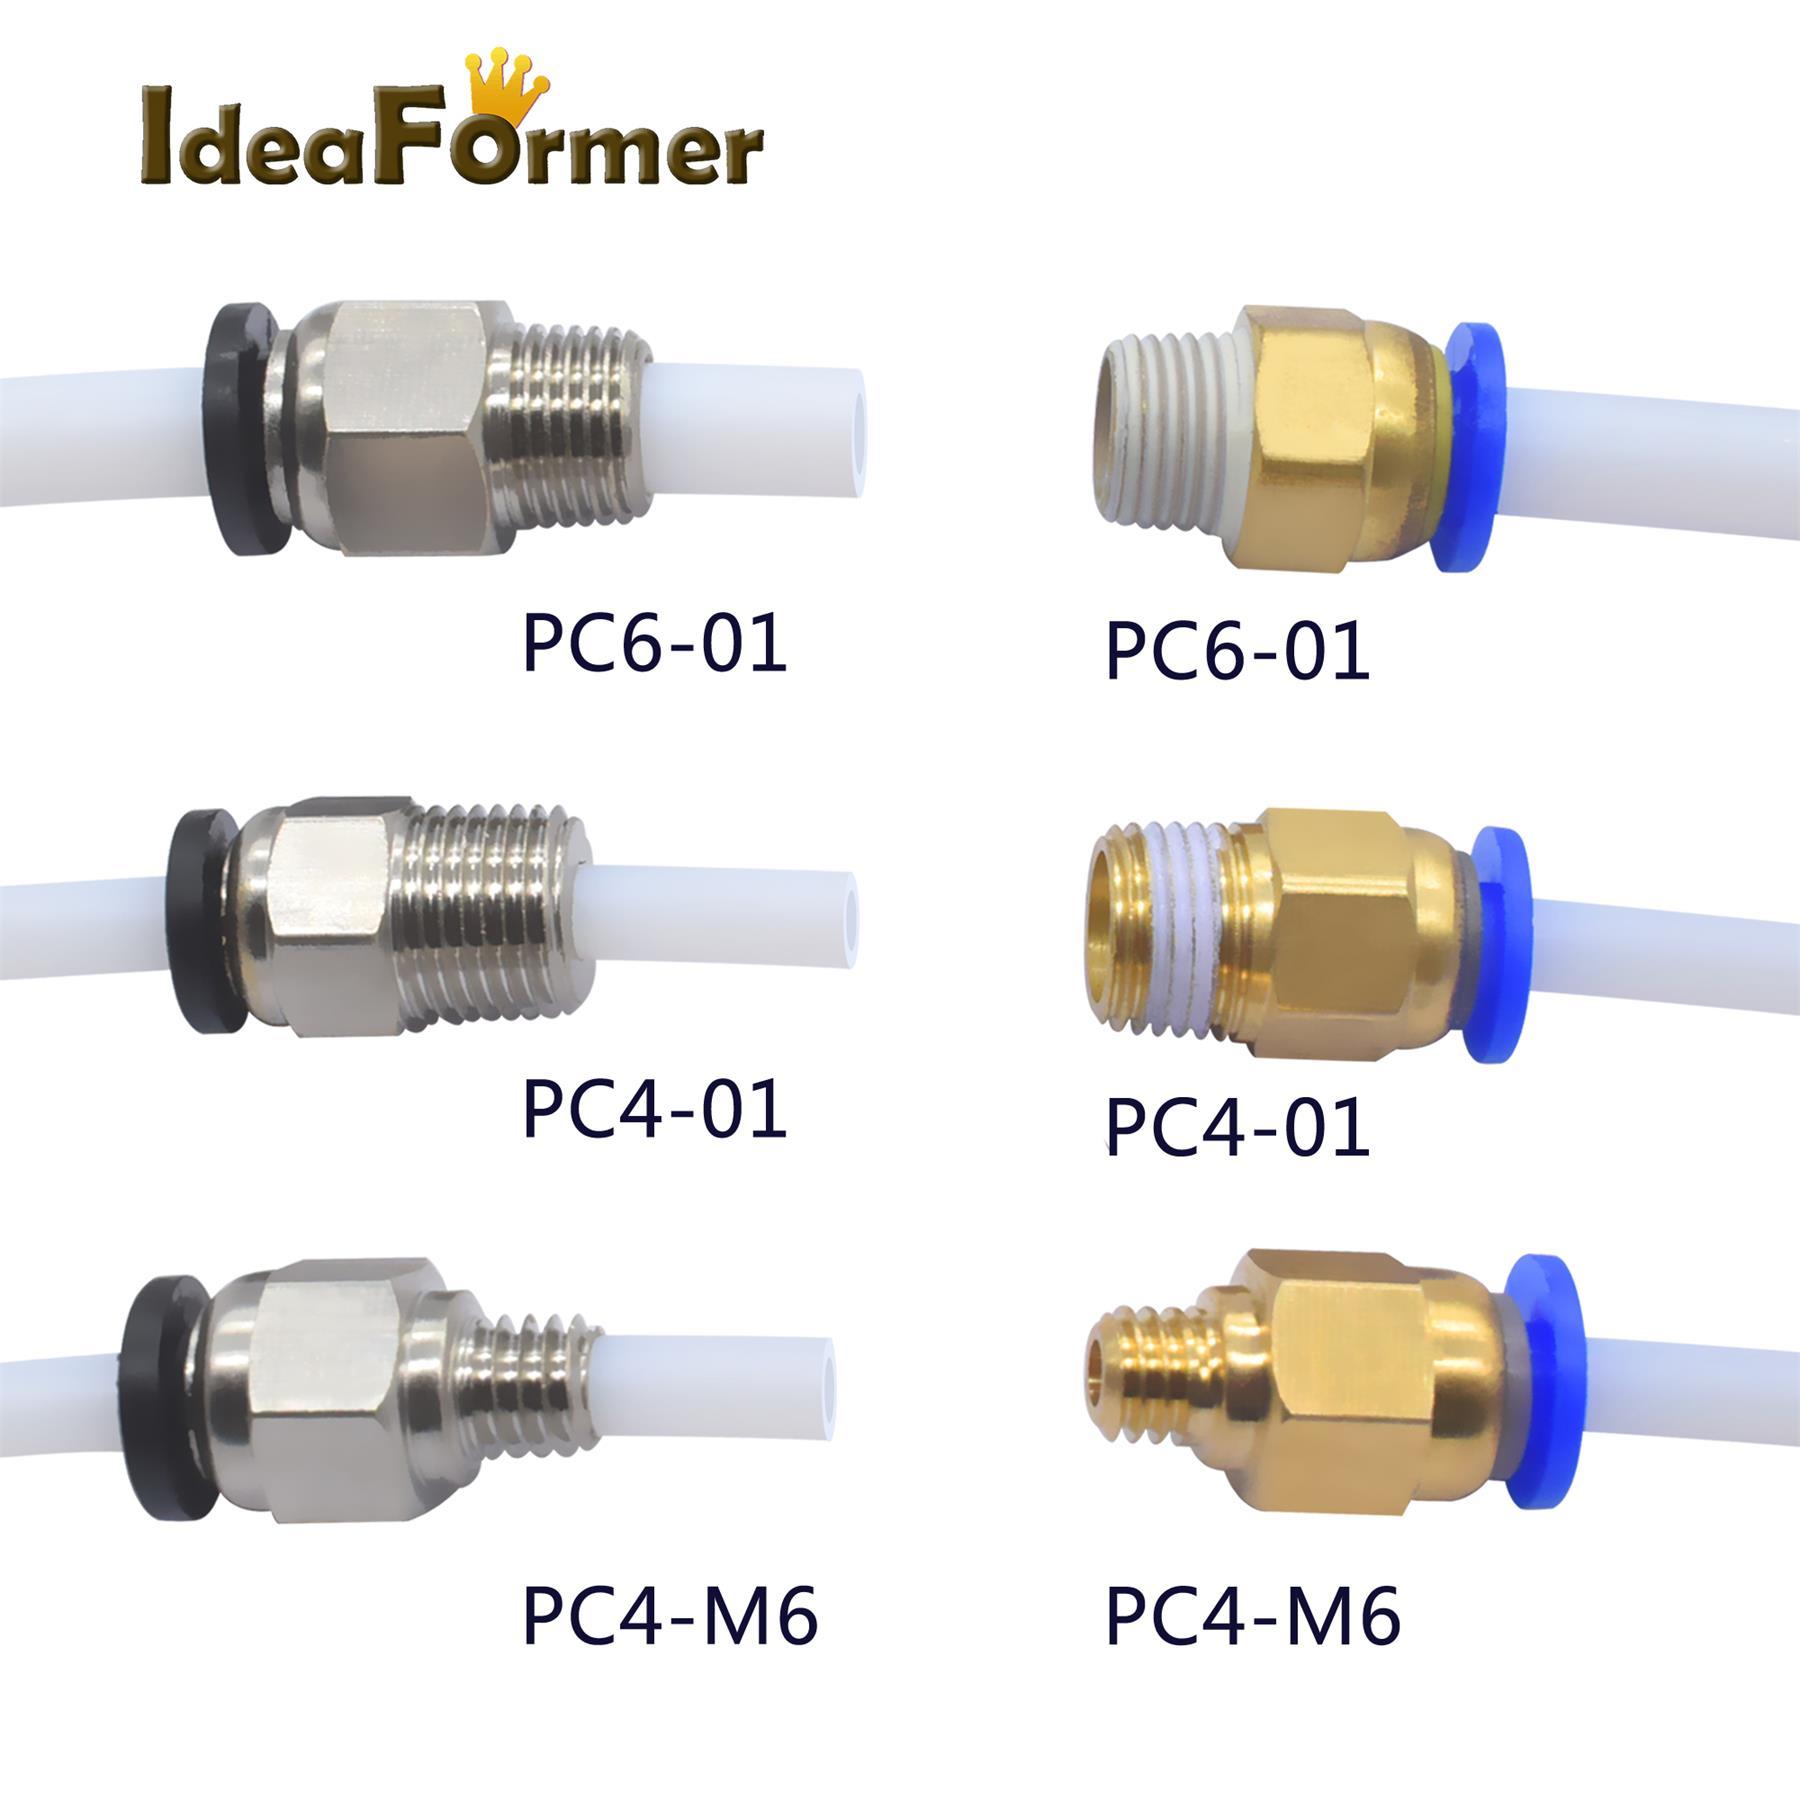 10pcs/lot Pneumatic Connectors For 3D Printers Parts Black/Blue Quick Jointer Feeding 1.75/3.0mm Filament Pipe Push Part